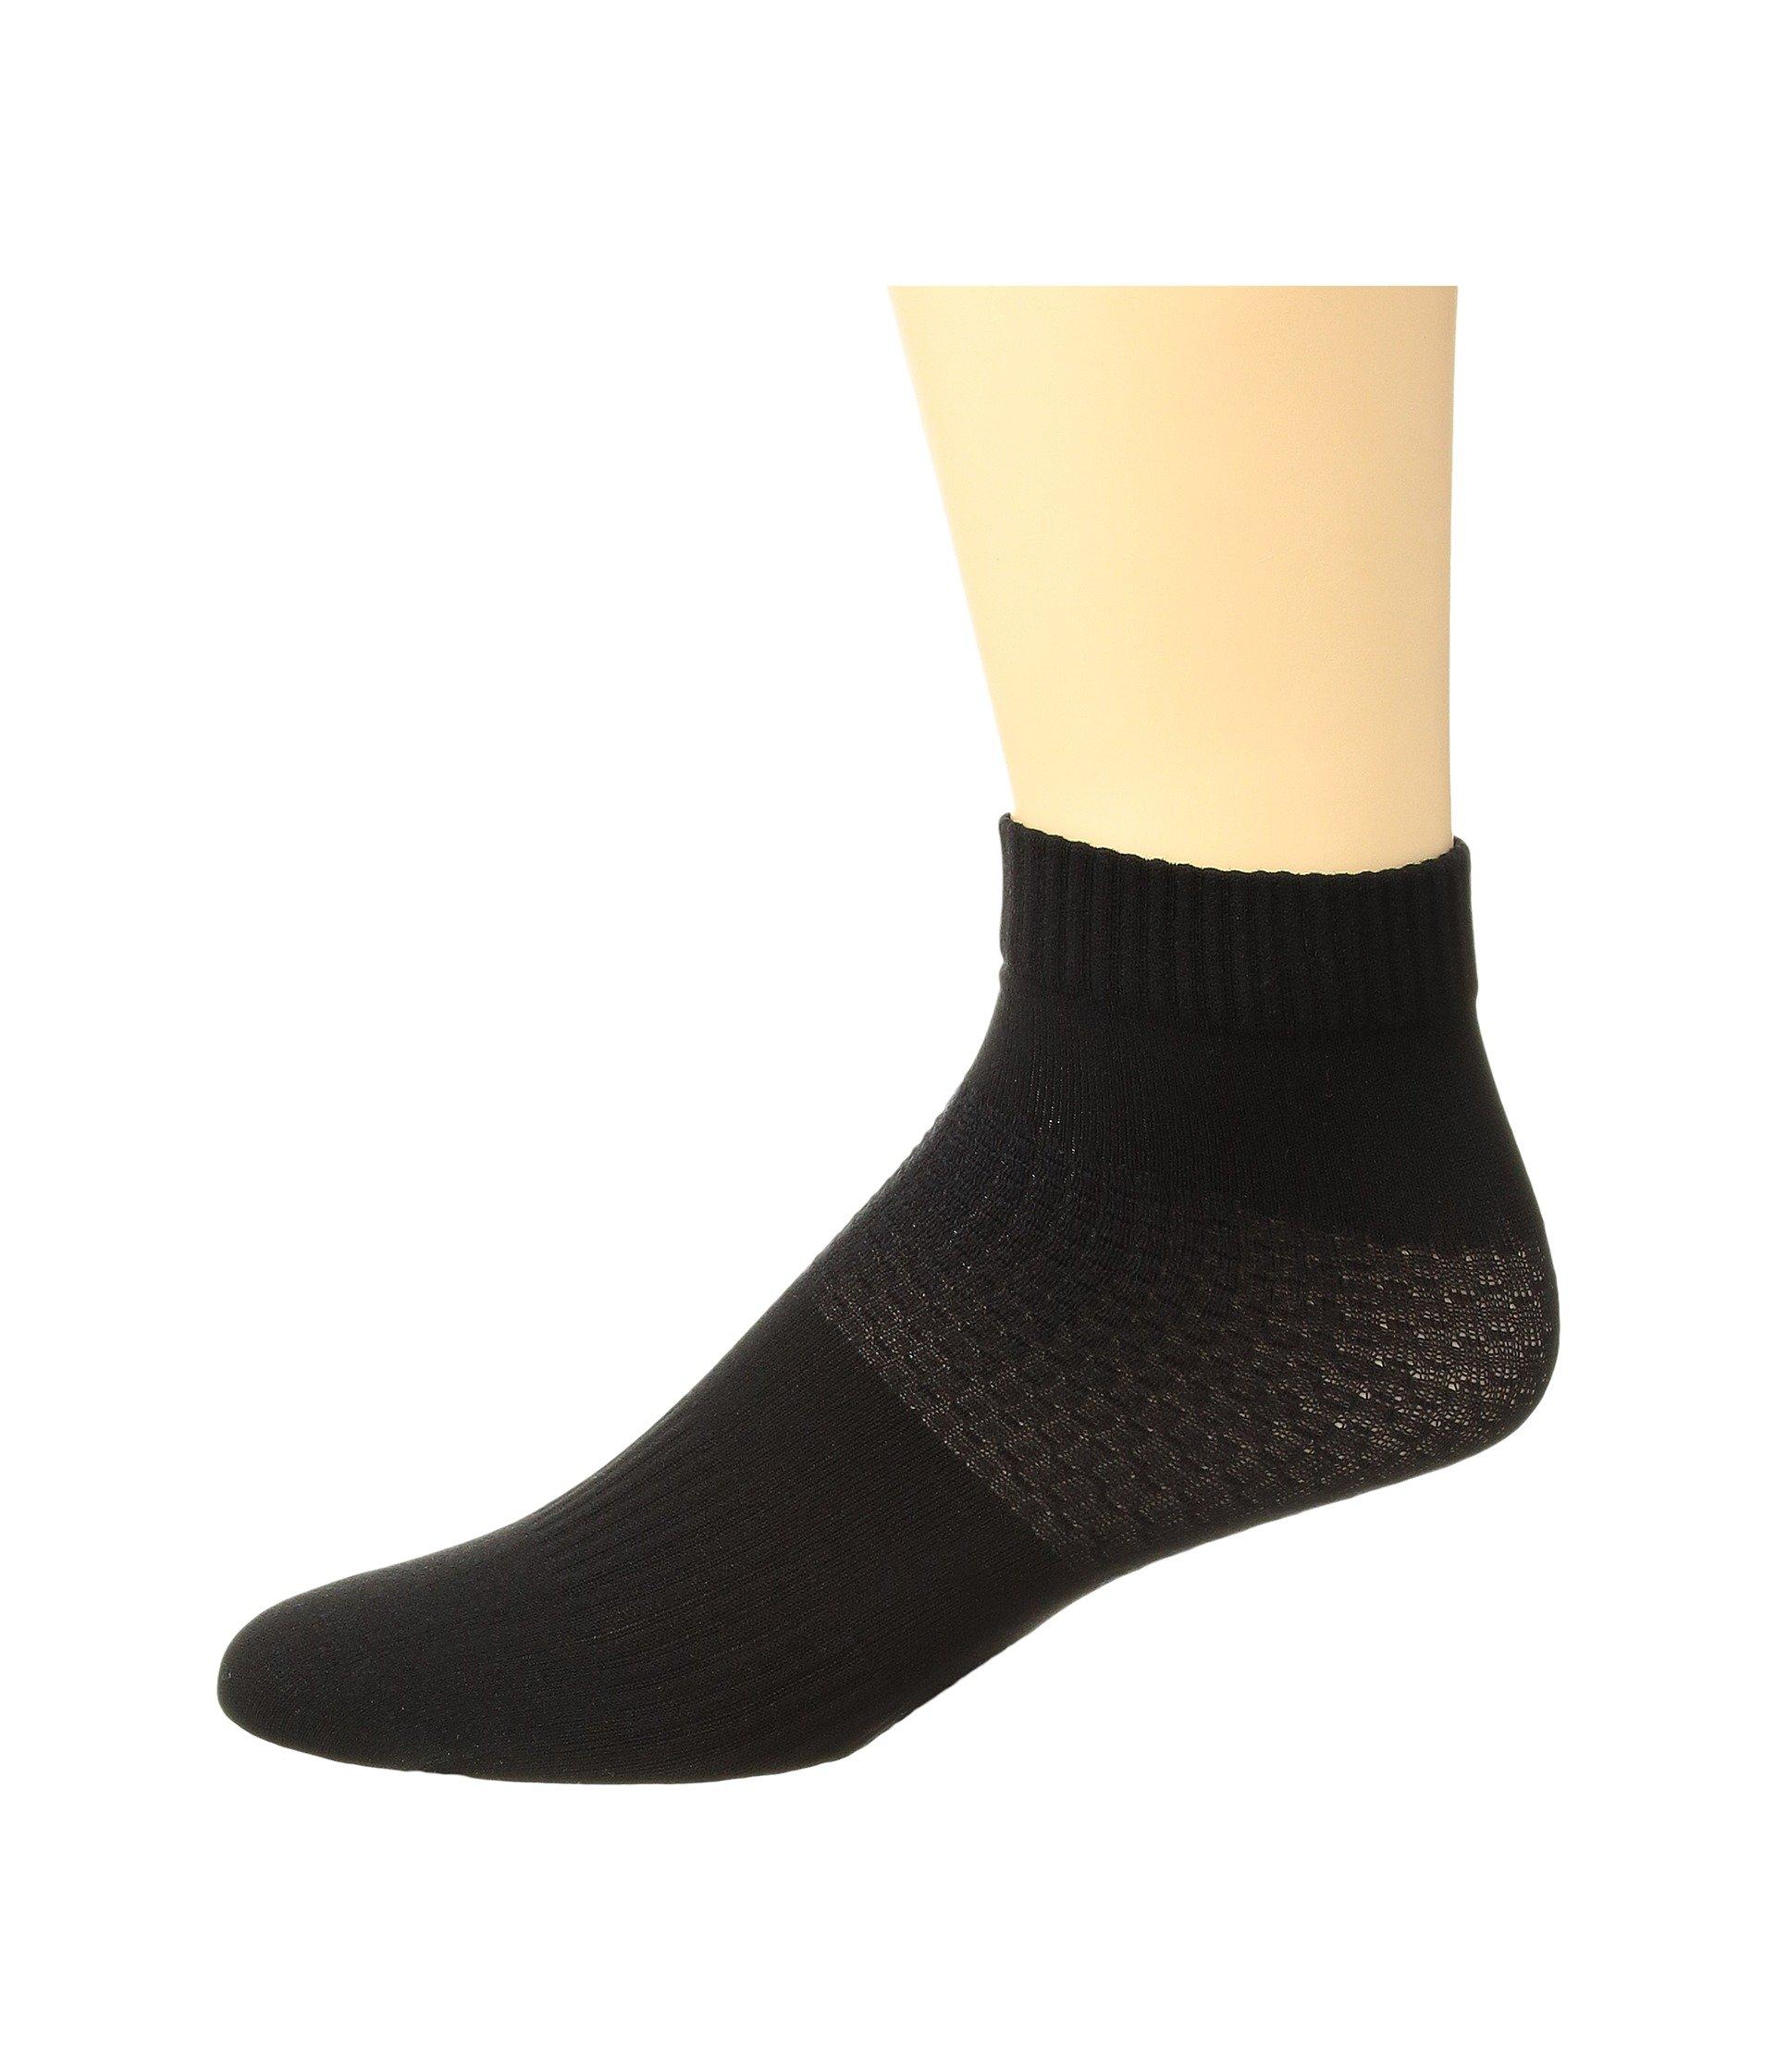 Independence Clothing The Co Black Universal Day Sock rw5UZqrp